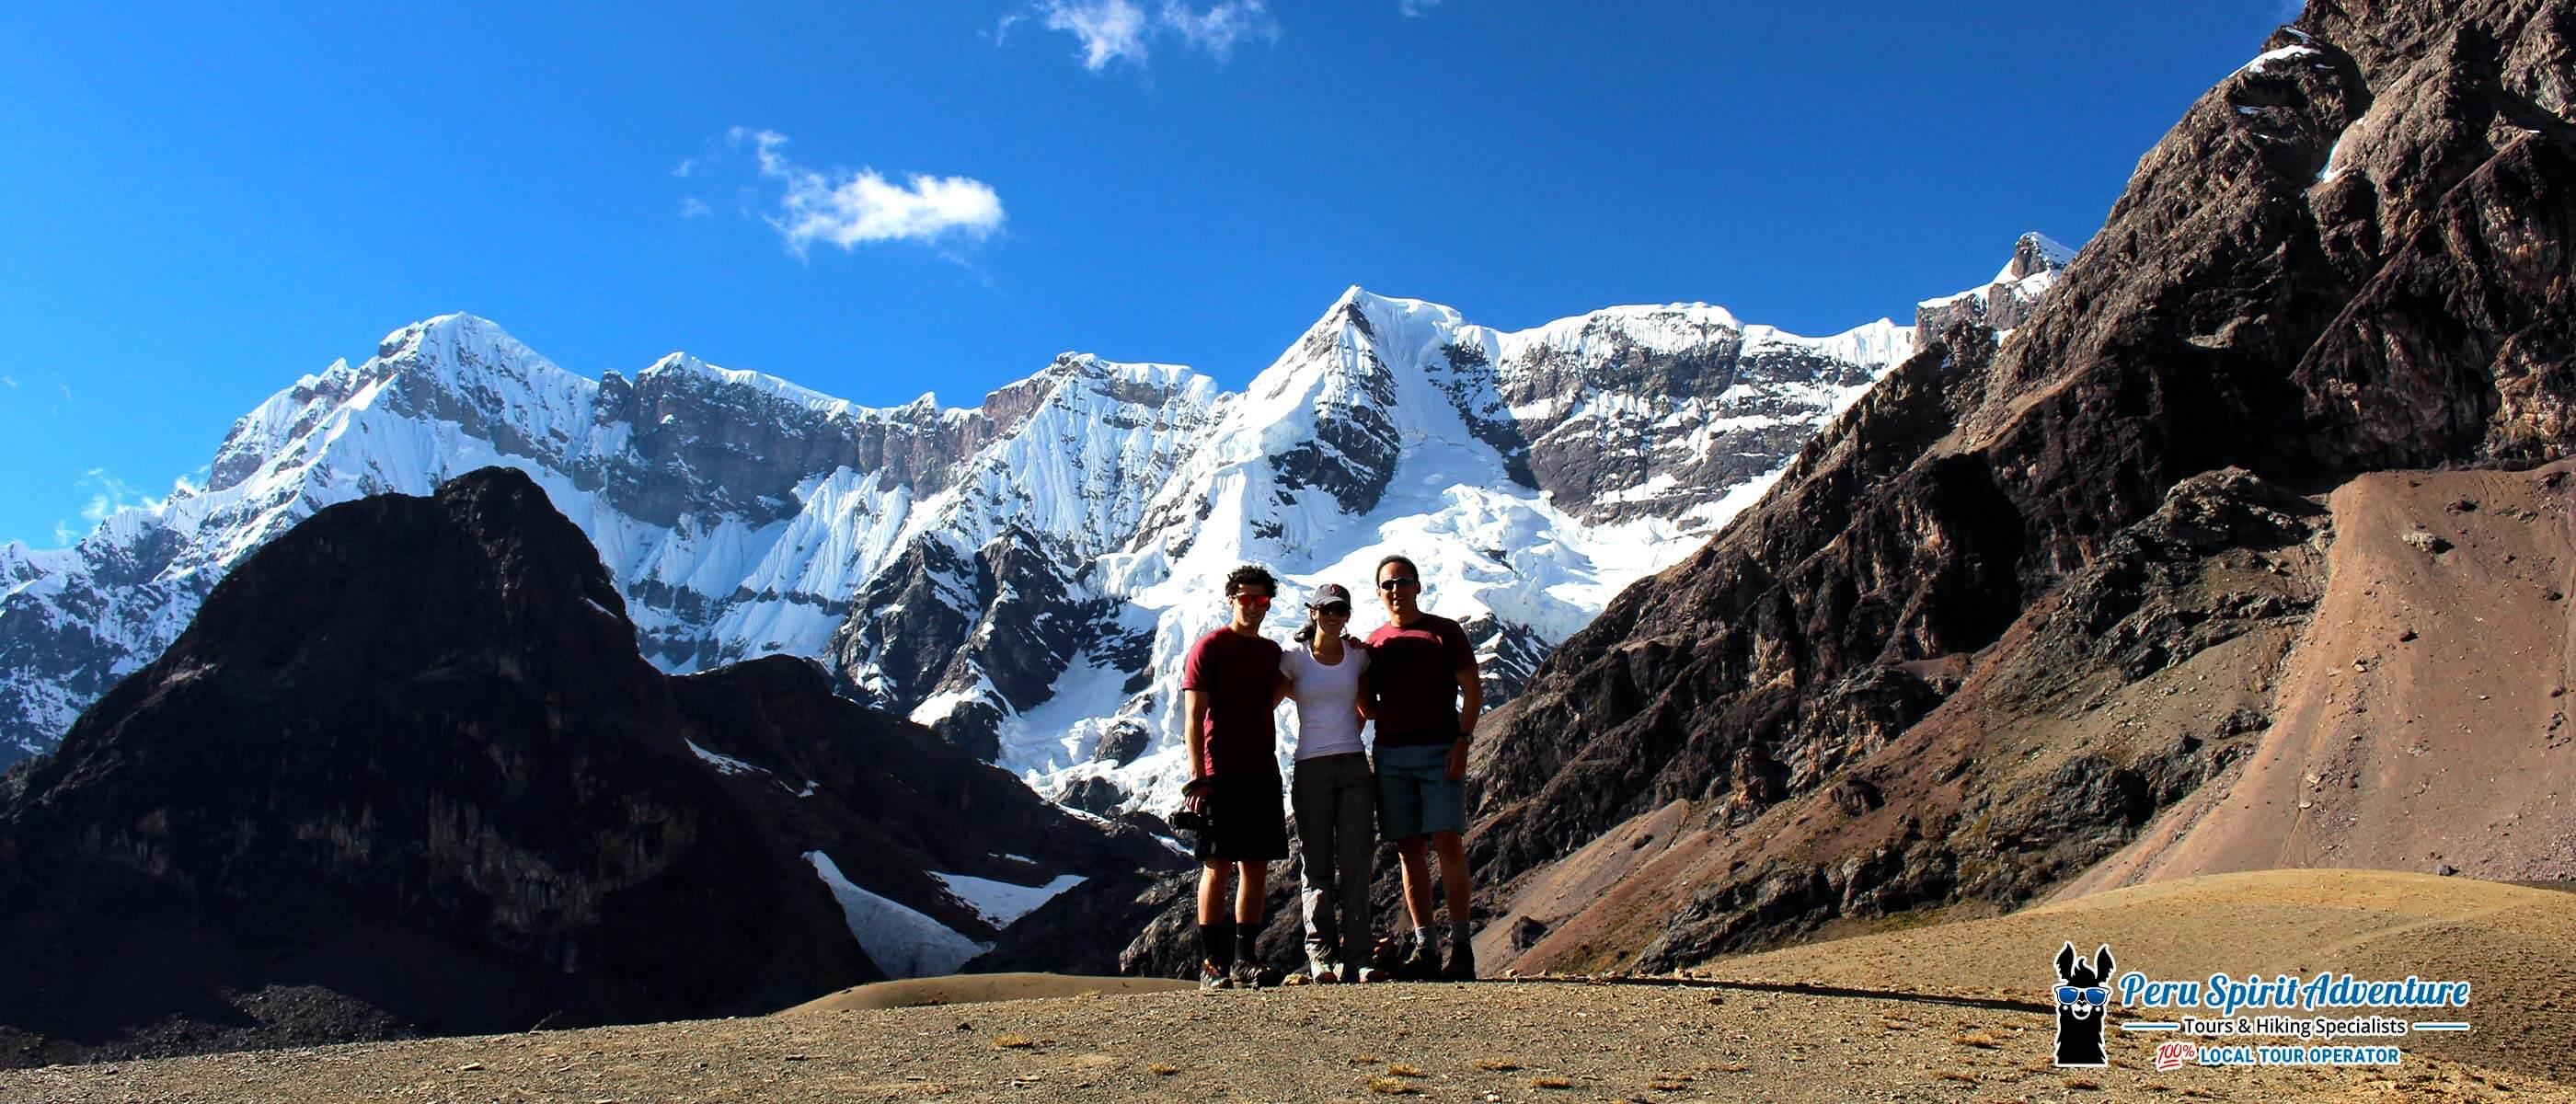 Rainbow Mountain trek 3 days via Ausangate Trail